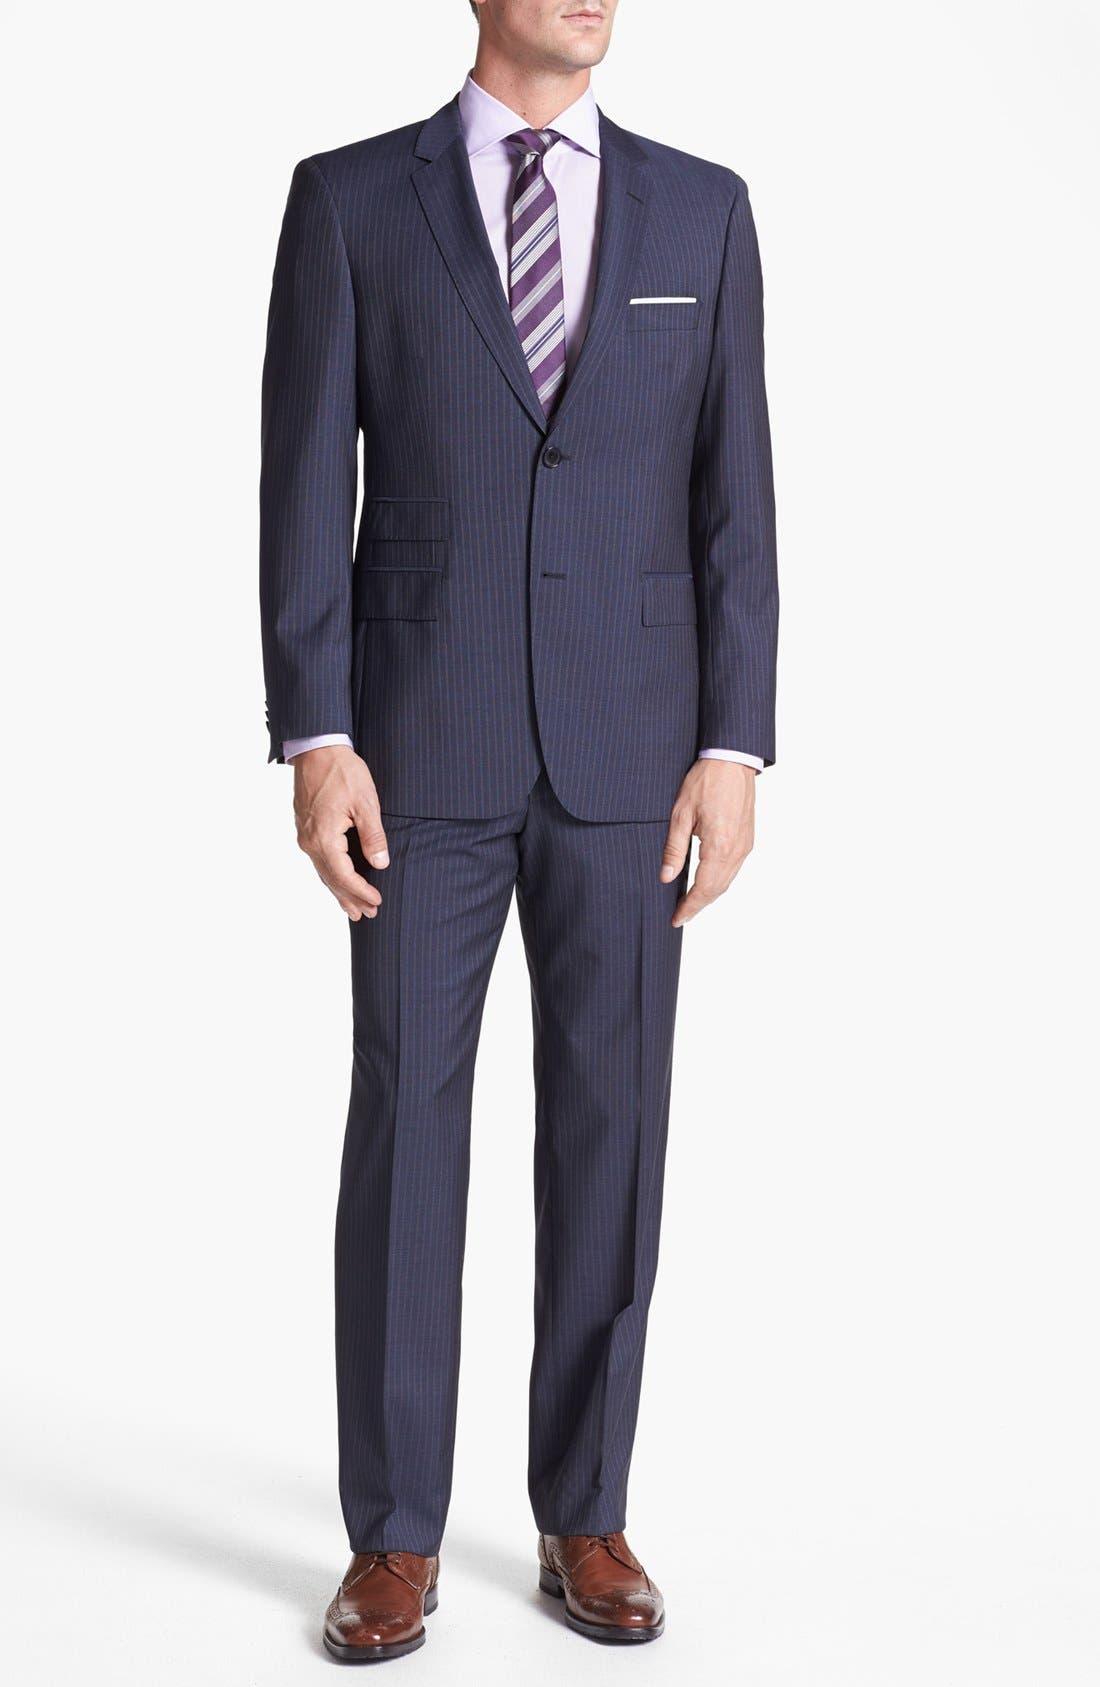 Alternate Image 1 Selected - BOSS HUGO BOSS 'Edison/Power' Classic Fit Stripe Suit